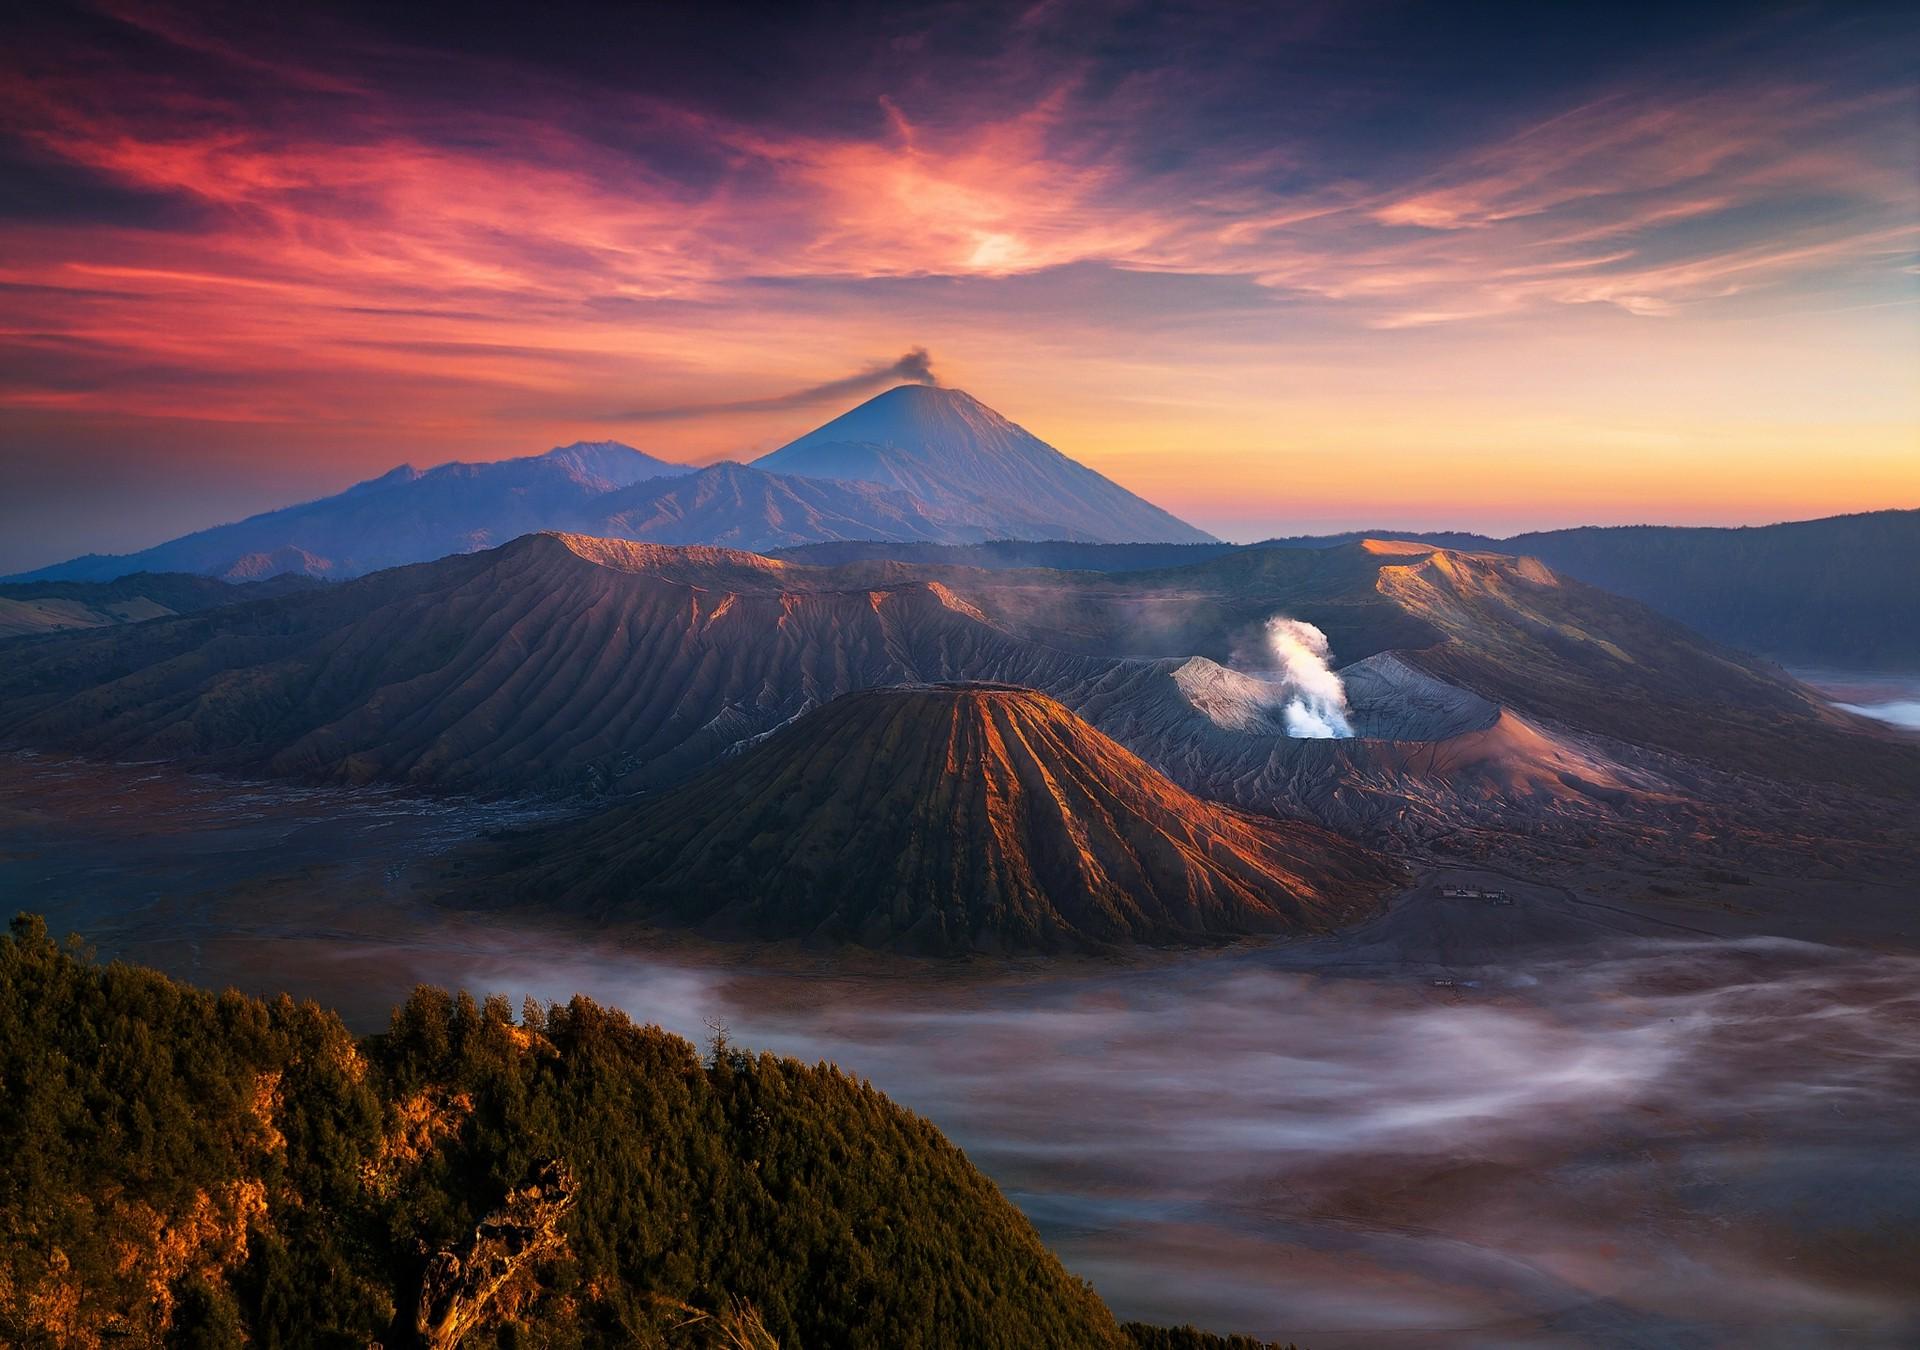 Wallpaper 1920x1350 Px Indonesia Landscape Mist Mountain